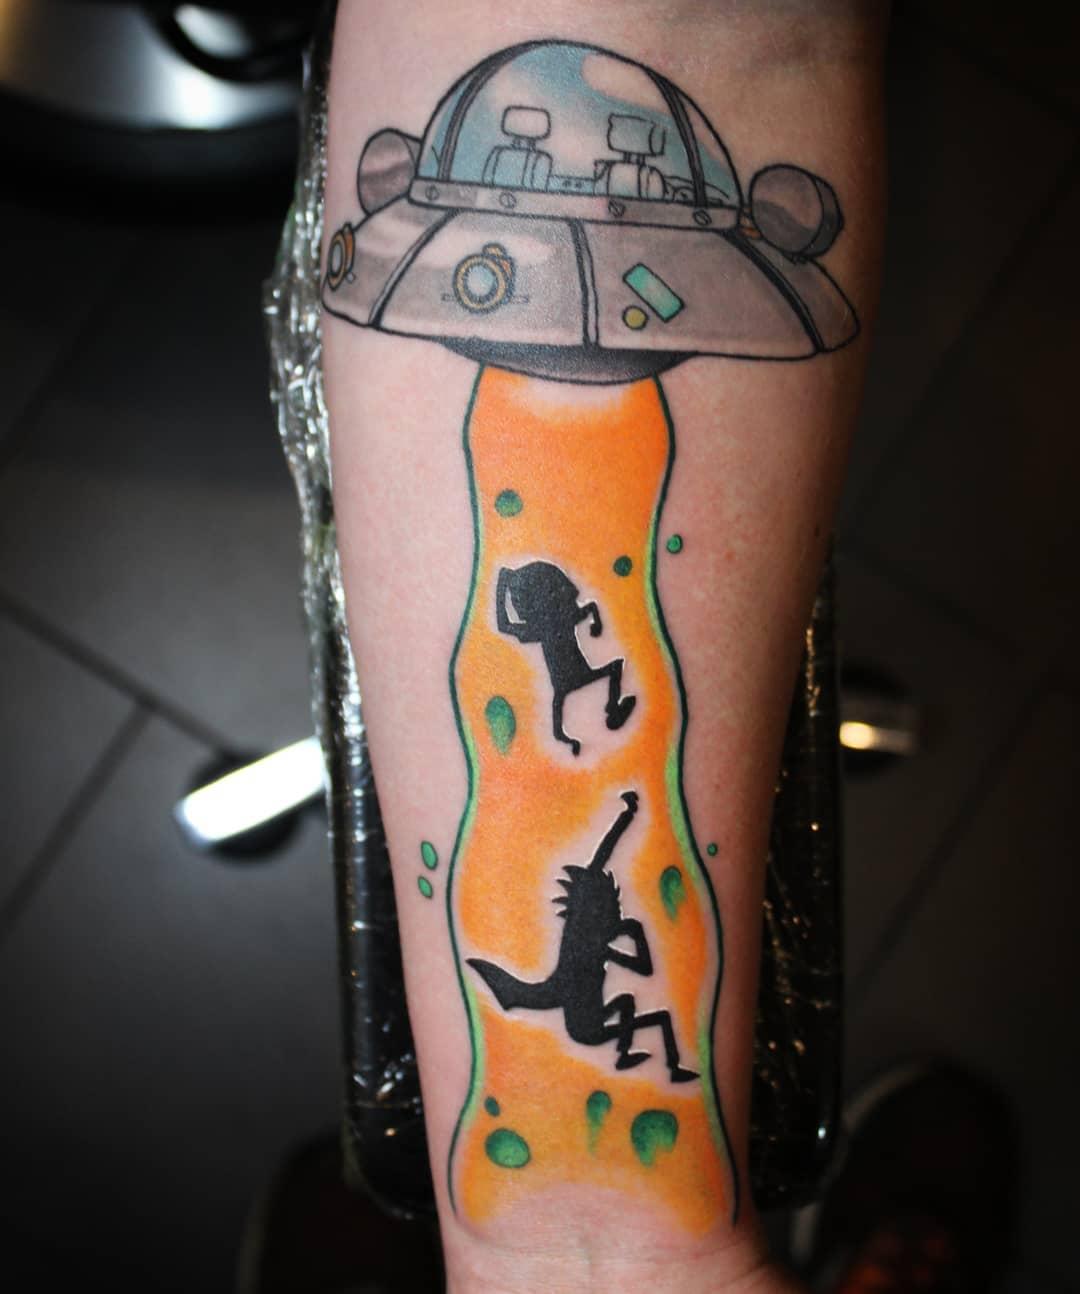 Thank you @iestherlein !!!! #germantattooers #germanartist #tattooworkers #tatto